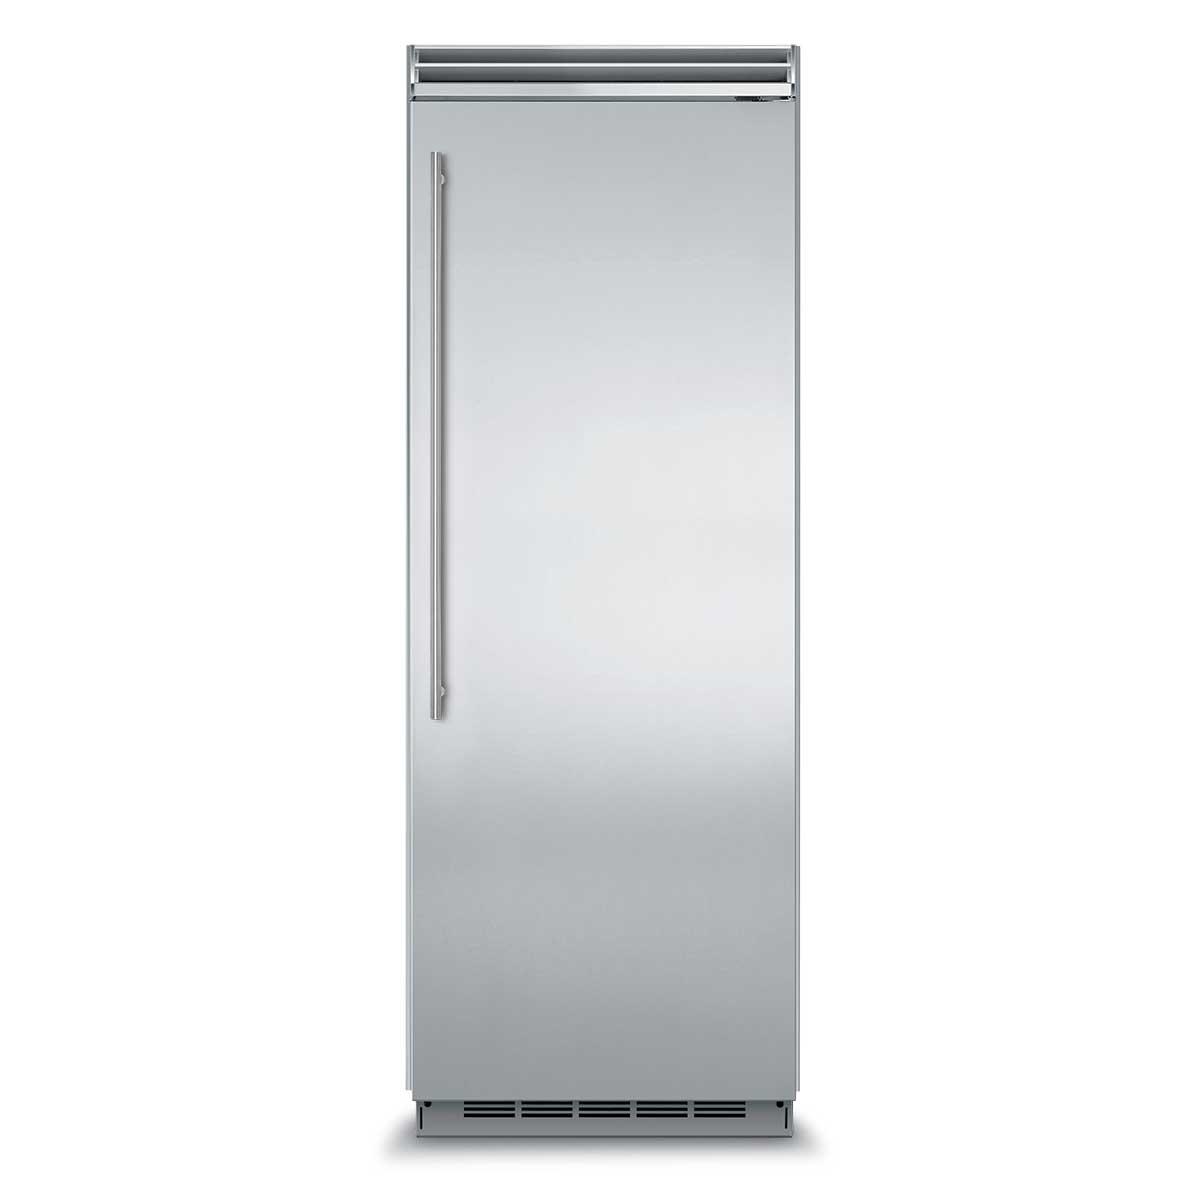 "Model: MP30RA2LS | Marvel  Marvel Professional Built-In 30"" All Refrigerator- Solid Stainless Steel Door   Left Hinge, Slim Designer Handle"